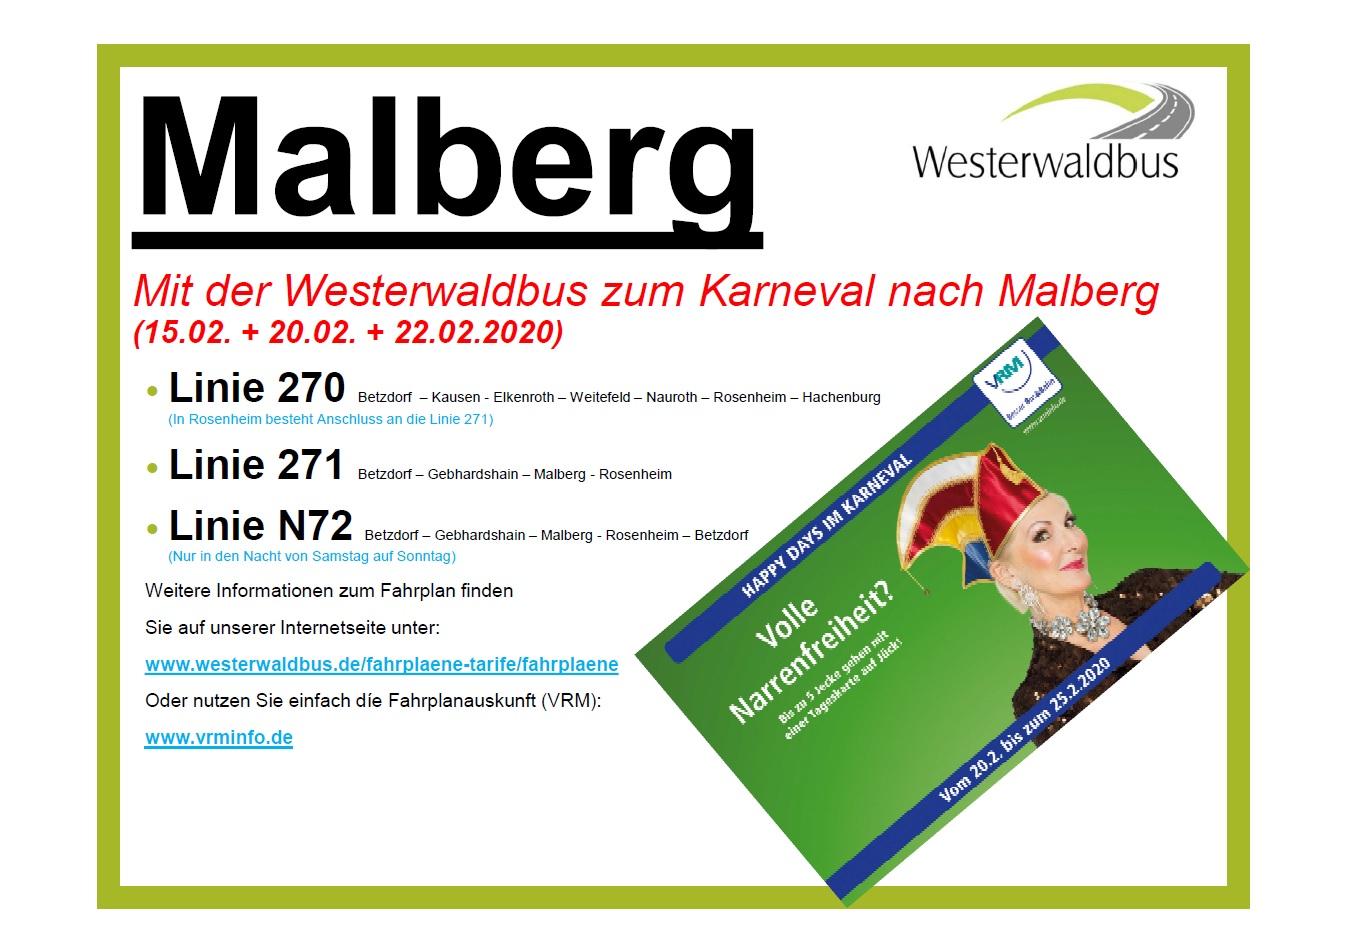 202002_Malberg Westerwald